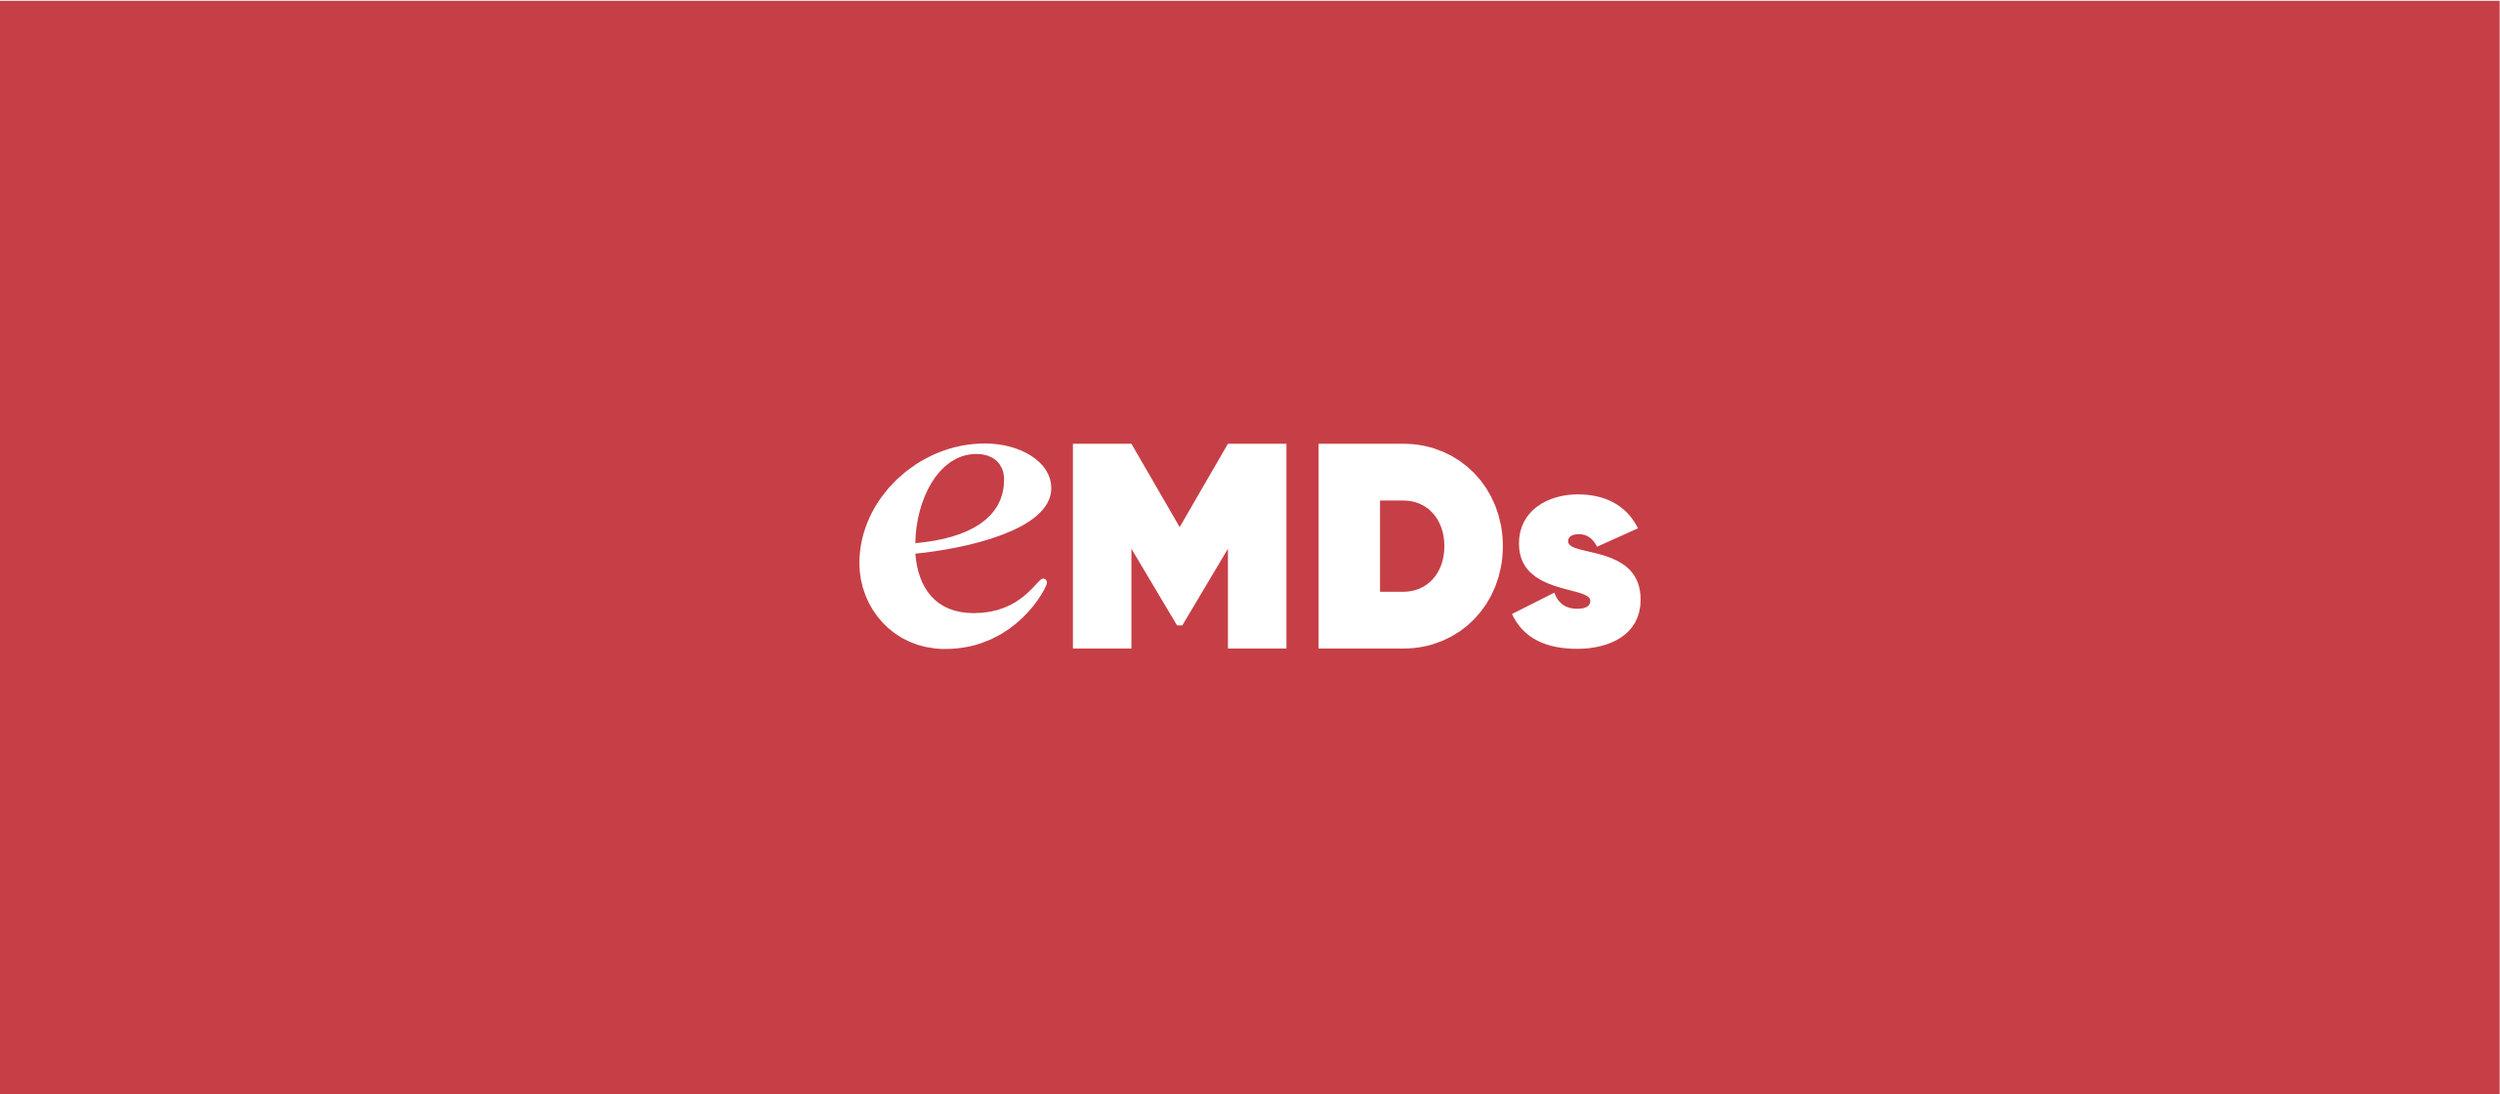 emds_brand-reverse-01@2x.jpg